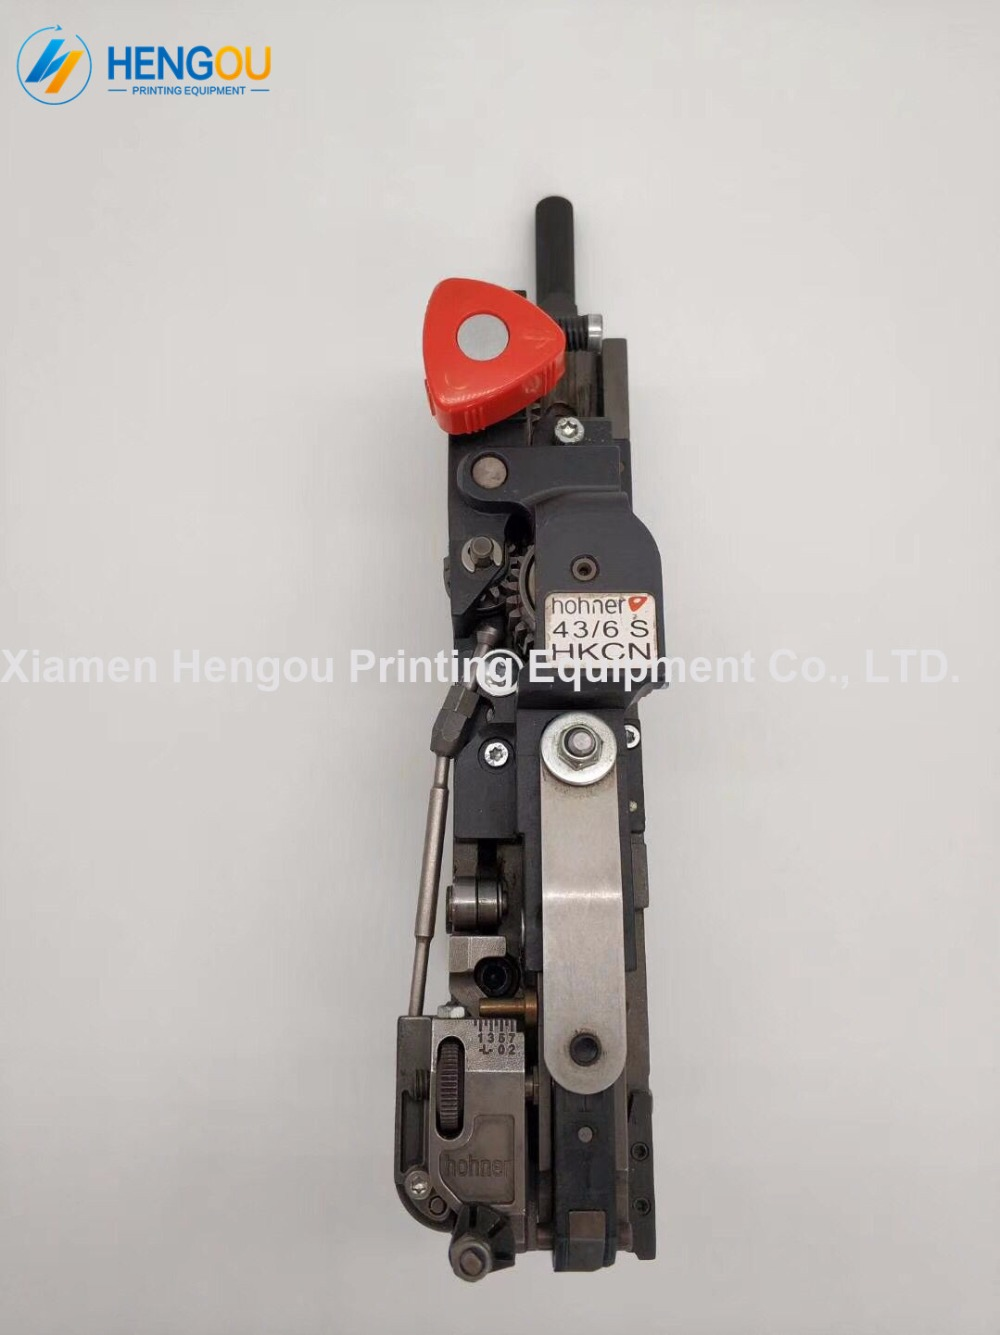 1 Piece DHL Free Shipping 43/6S Narrow Binding Head 43/6S Hohner Stitching Head цена